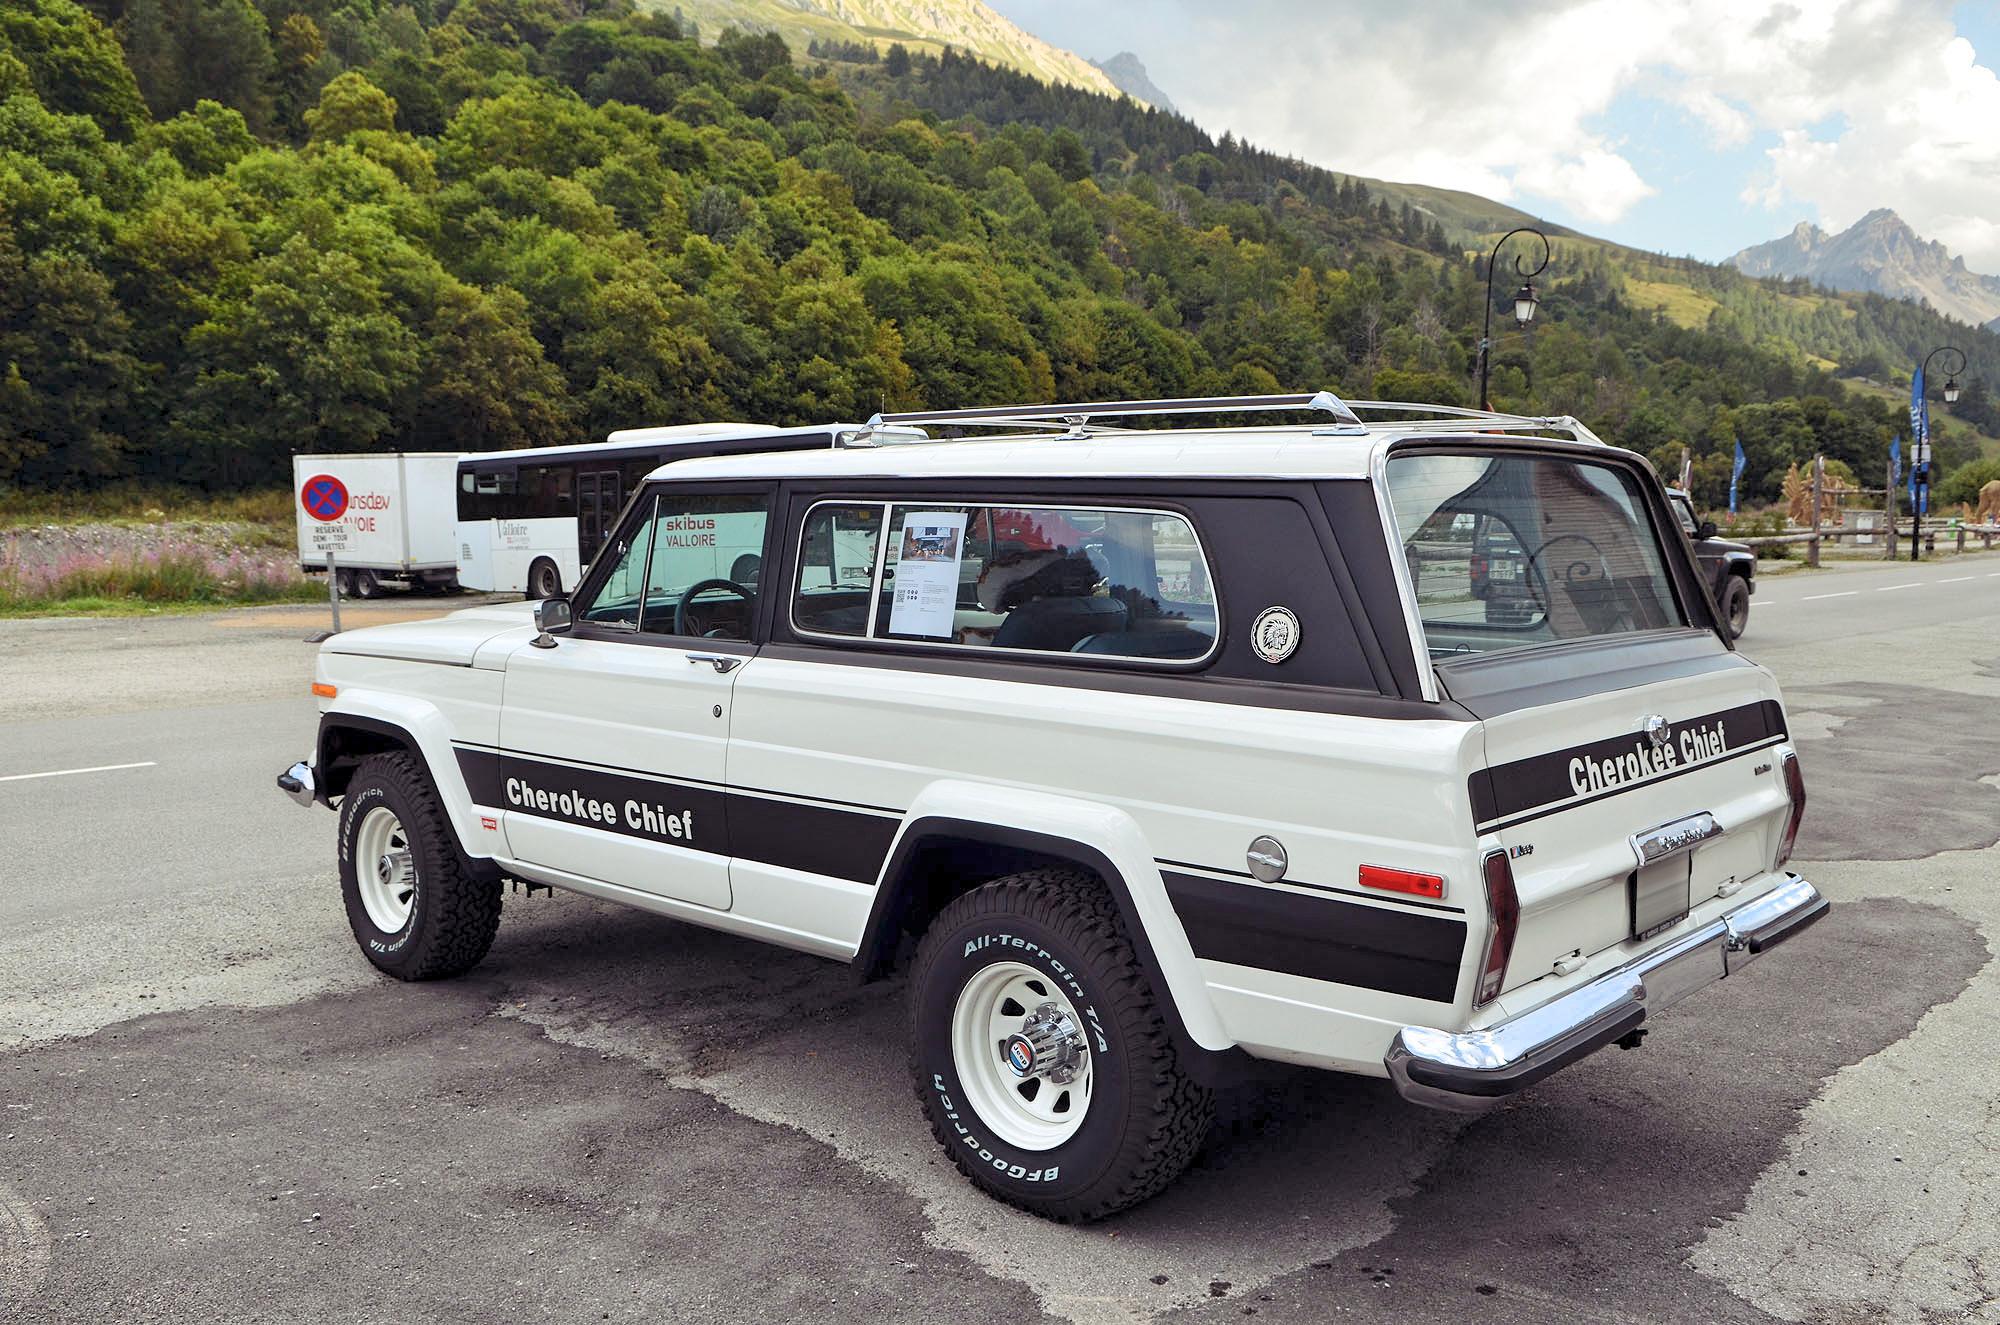 jeep-cherokee-chief-valloire-054.JPG